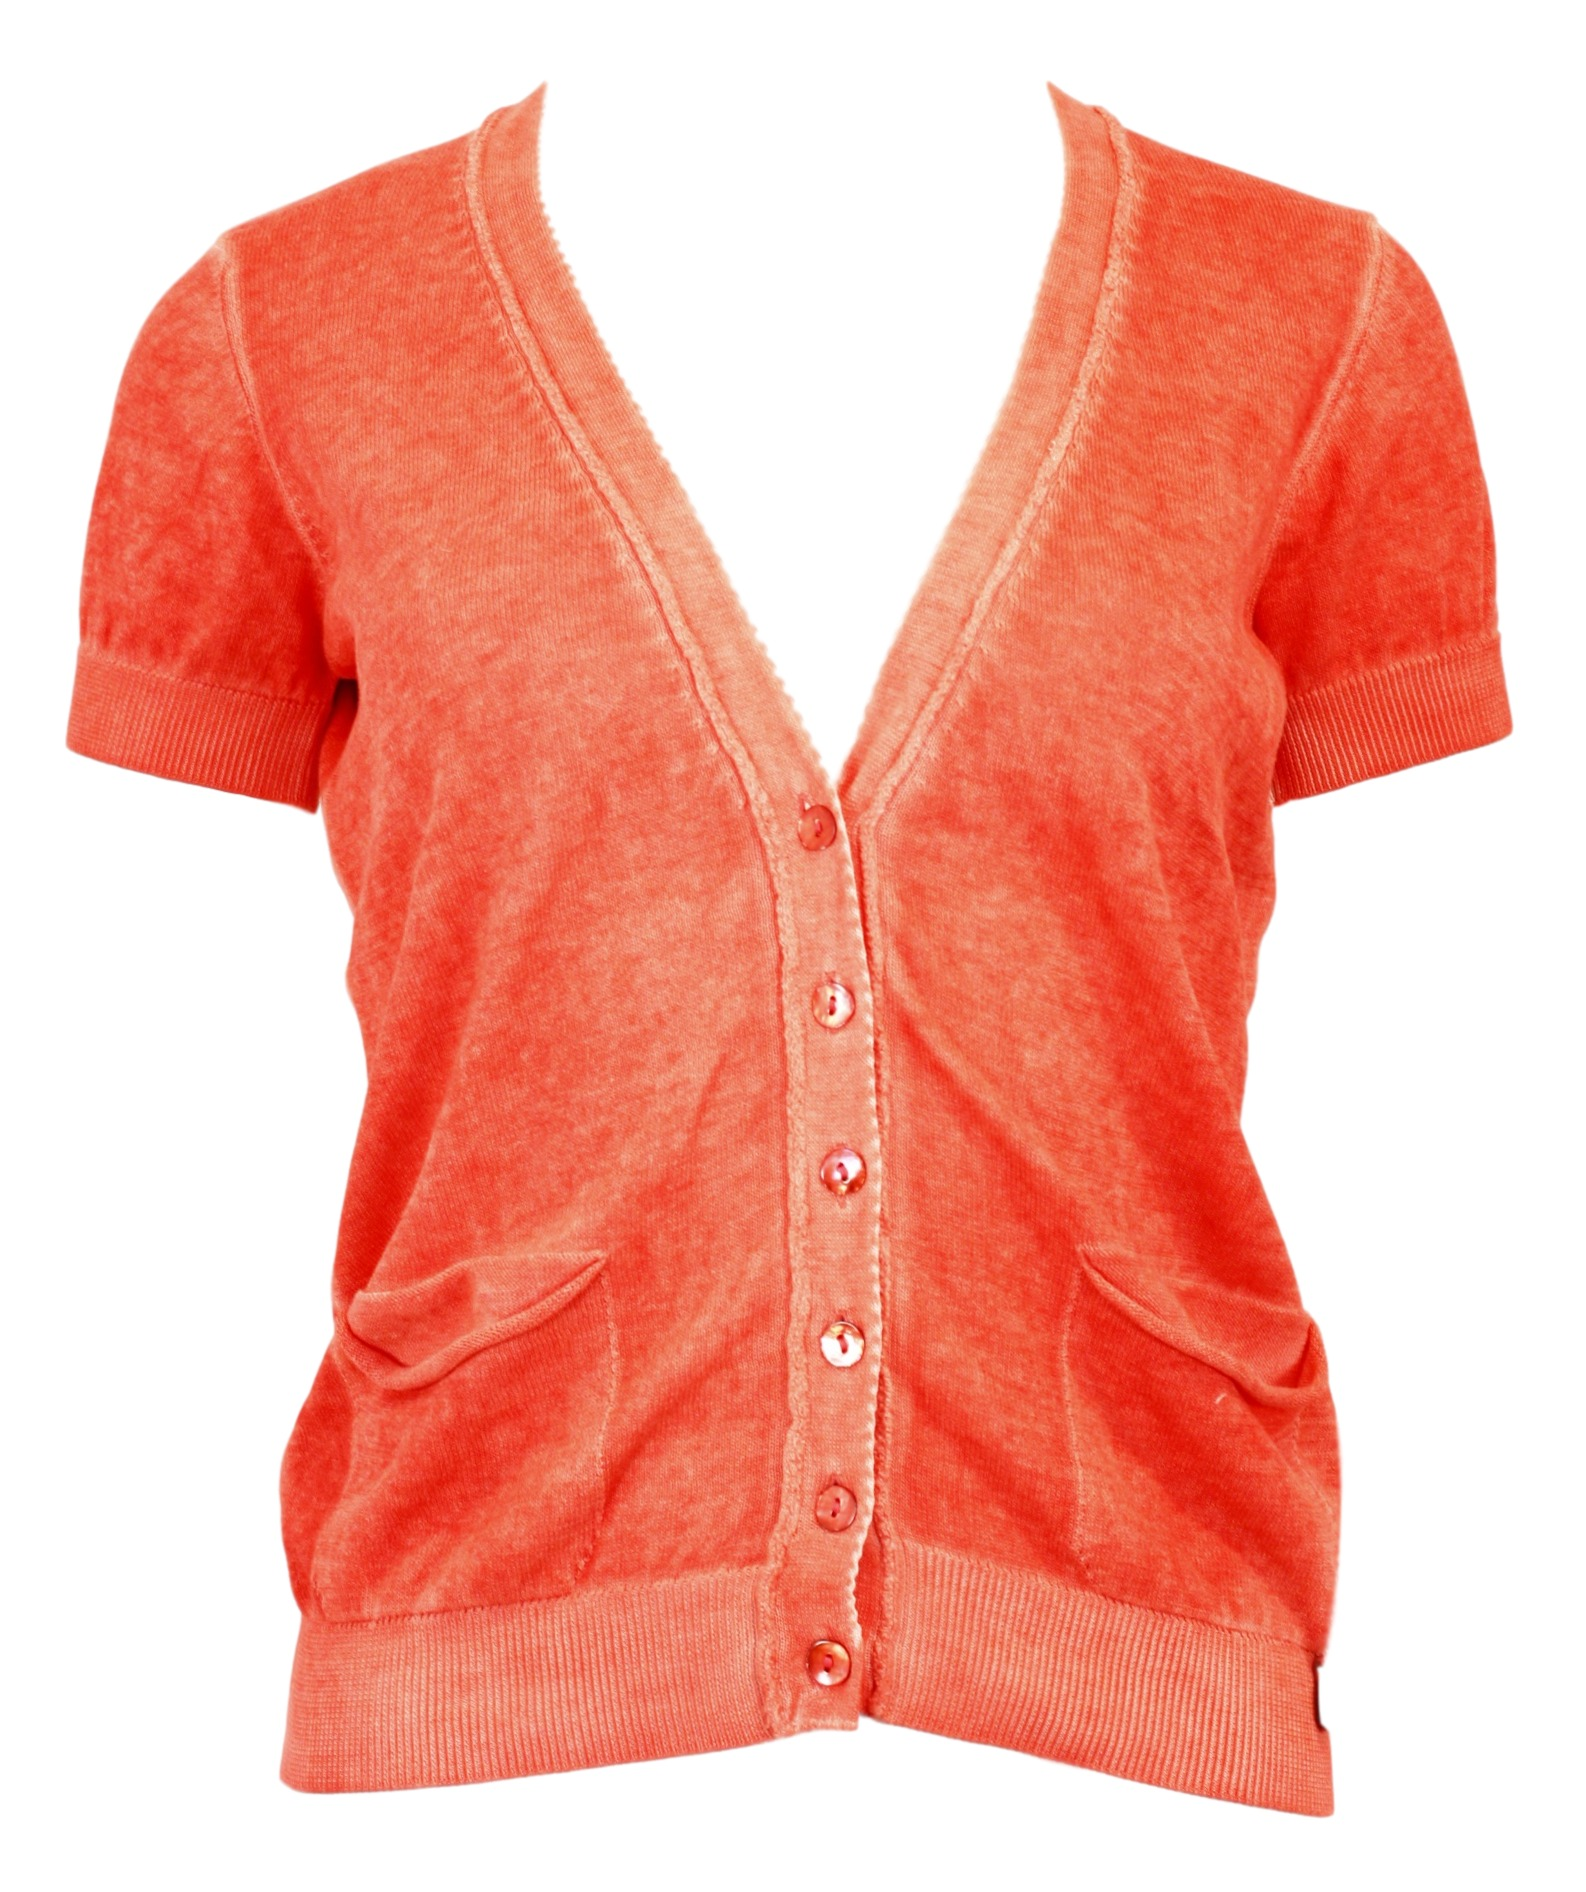 Dámský svetřík 15Q107 - Rich Royal Barva: korál, Velikost: S